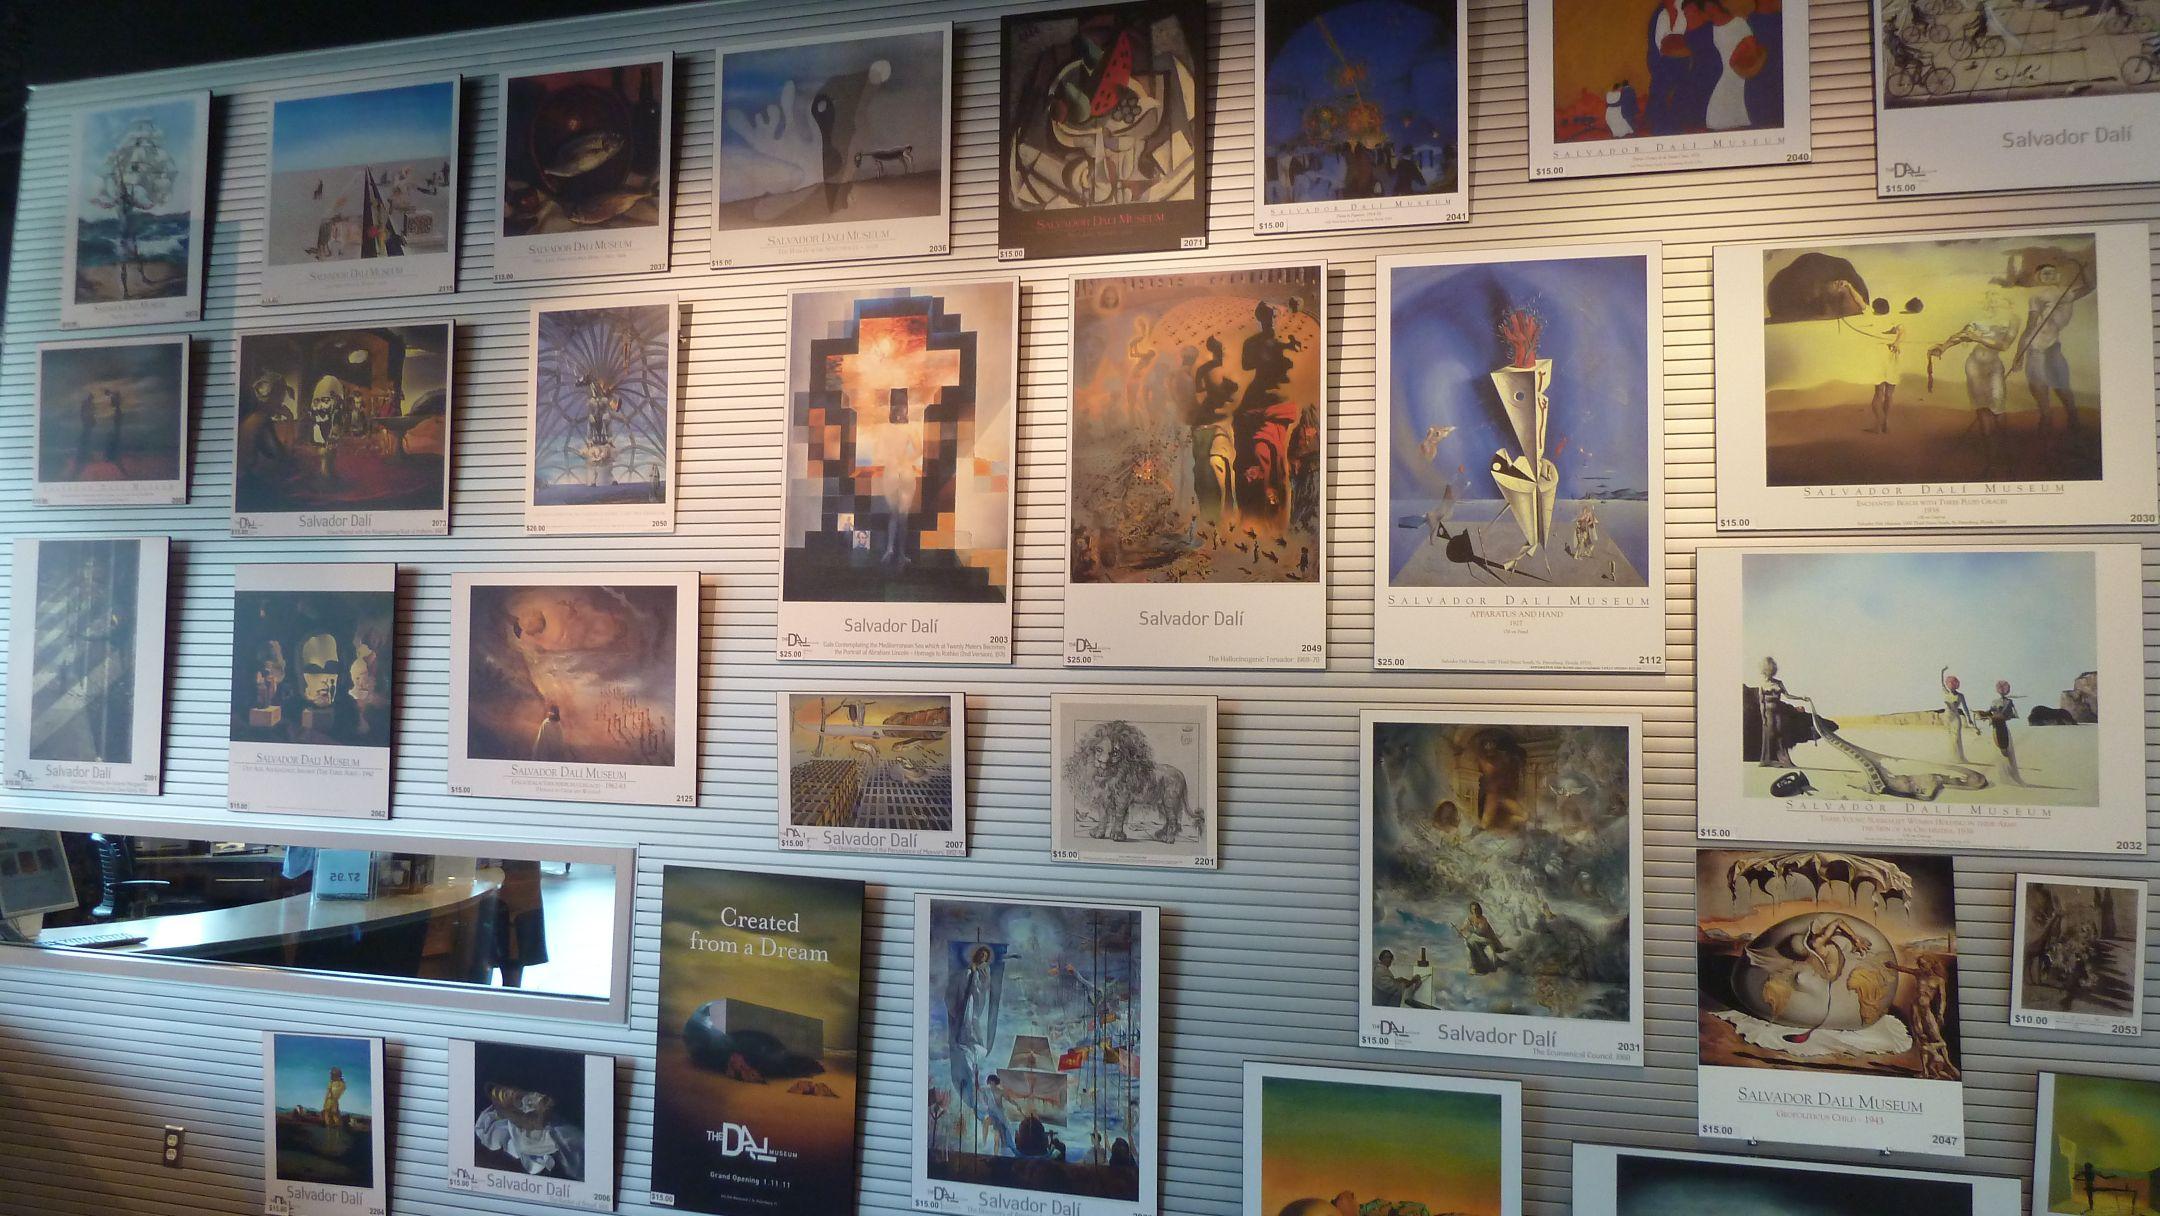 Tampa Area – Dali Museum